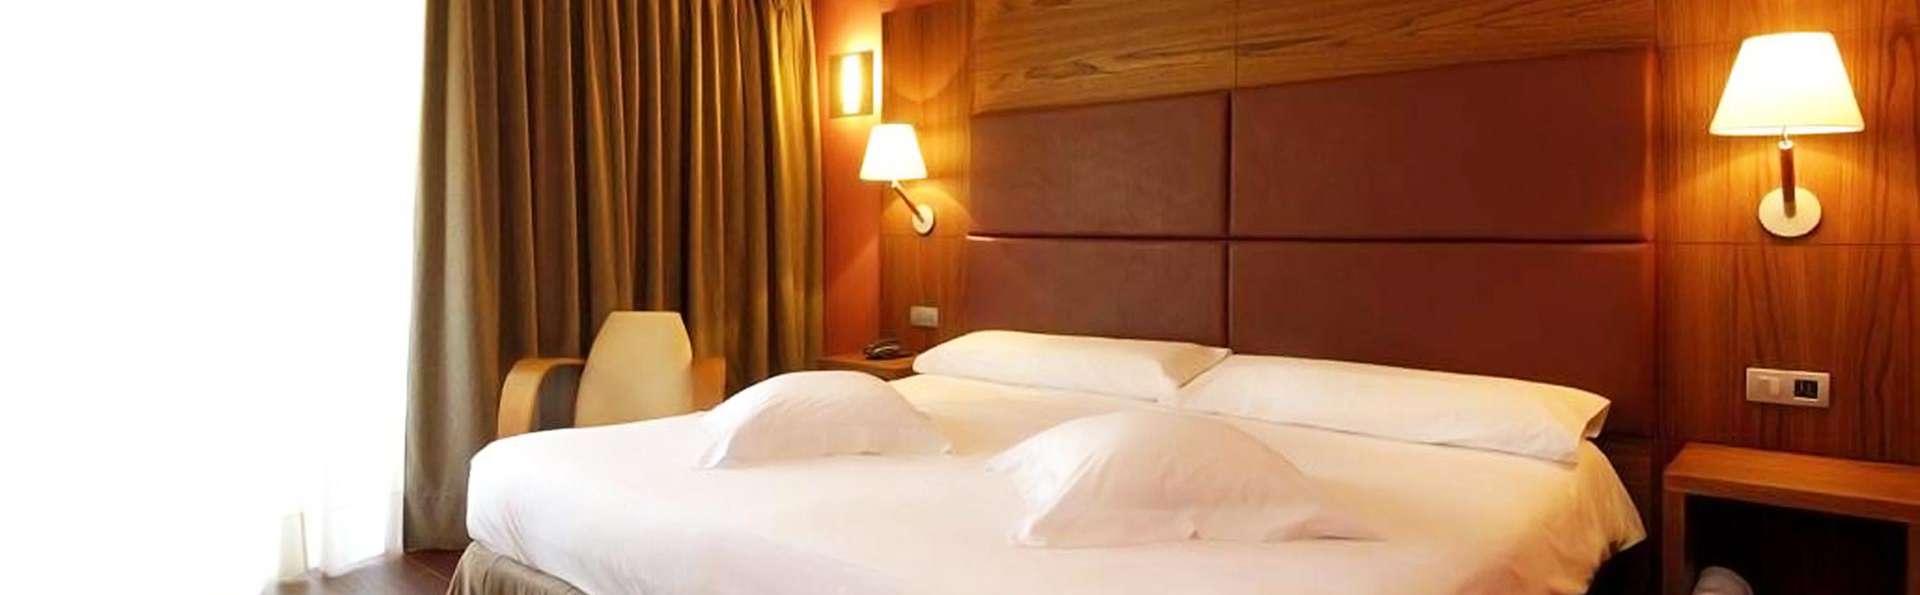 Hotel Riberies - edit_room1.jpg